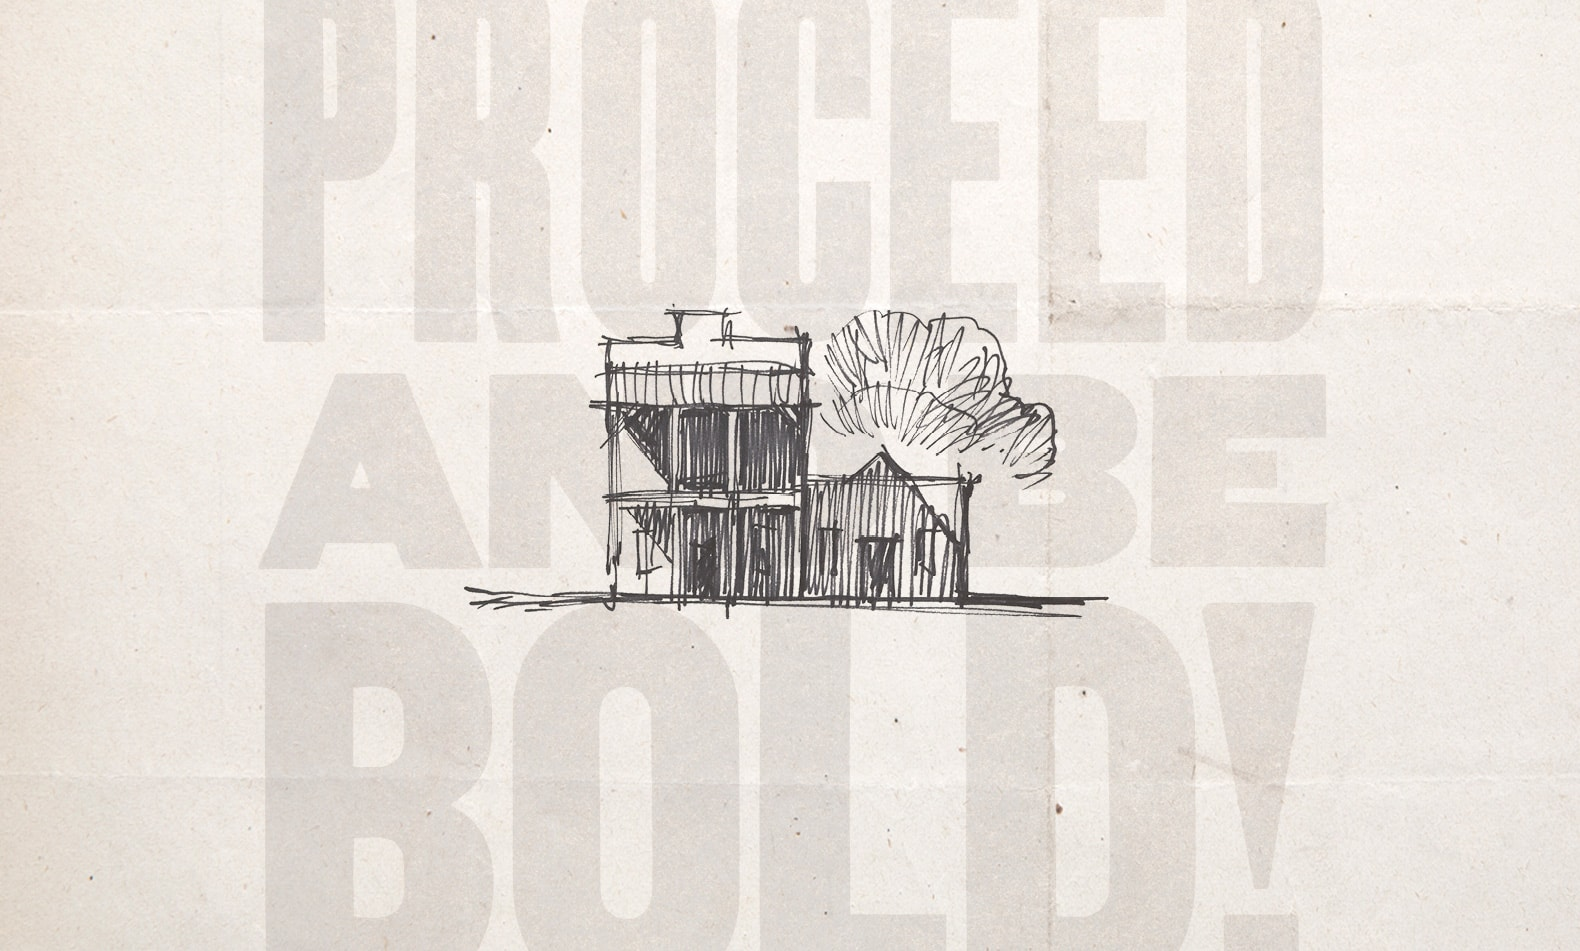 sketch of red barn